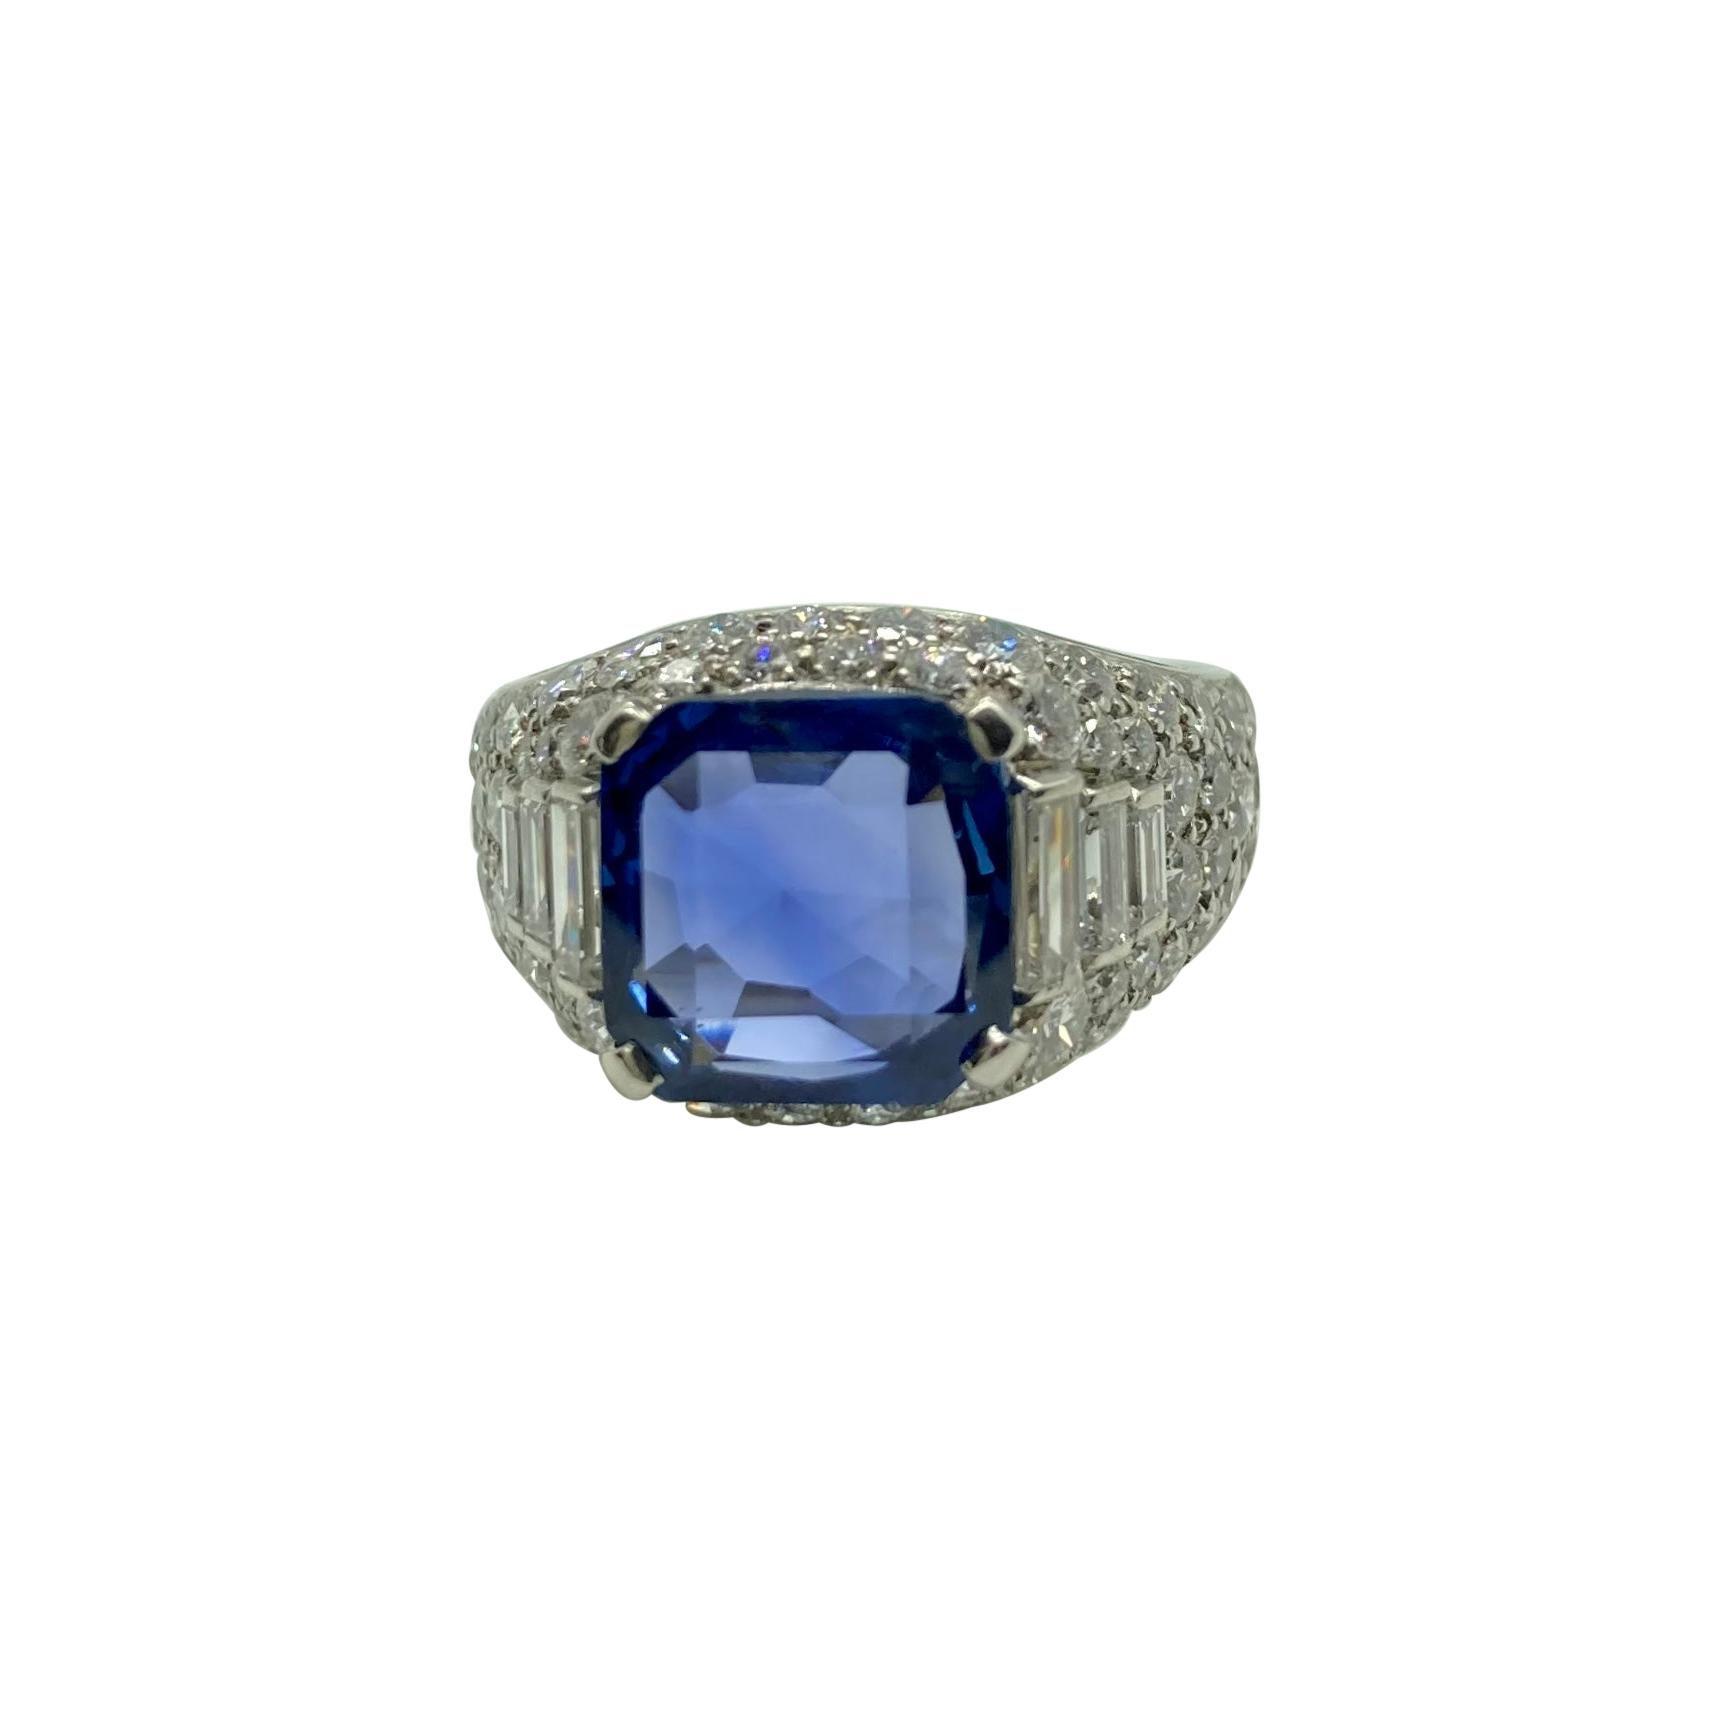 Bulgari 3.75 Carat Burmese Sapphire & Diamond Trombino Ring